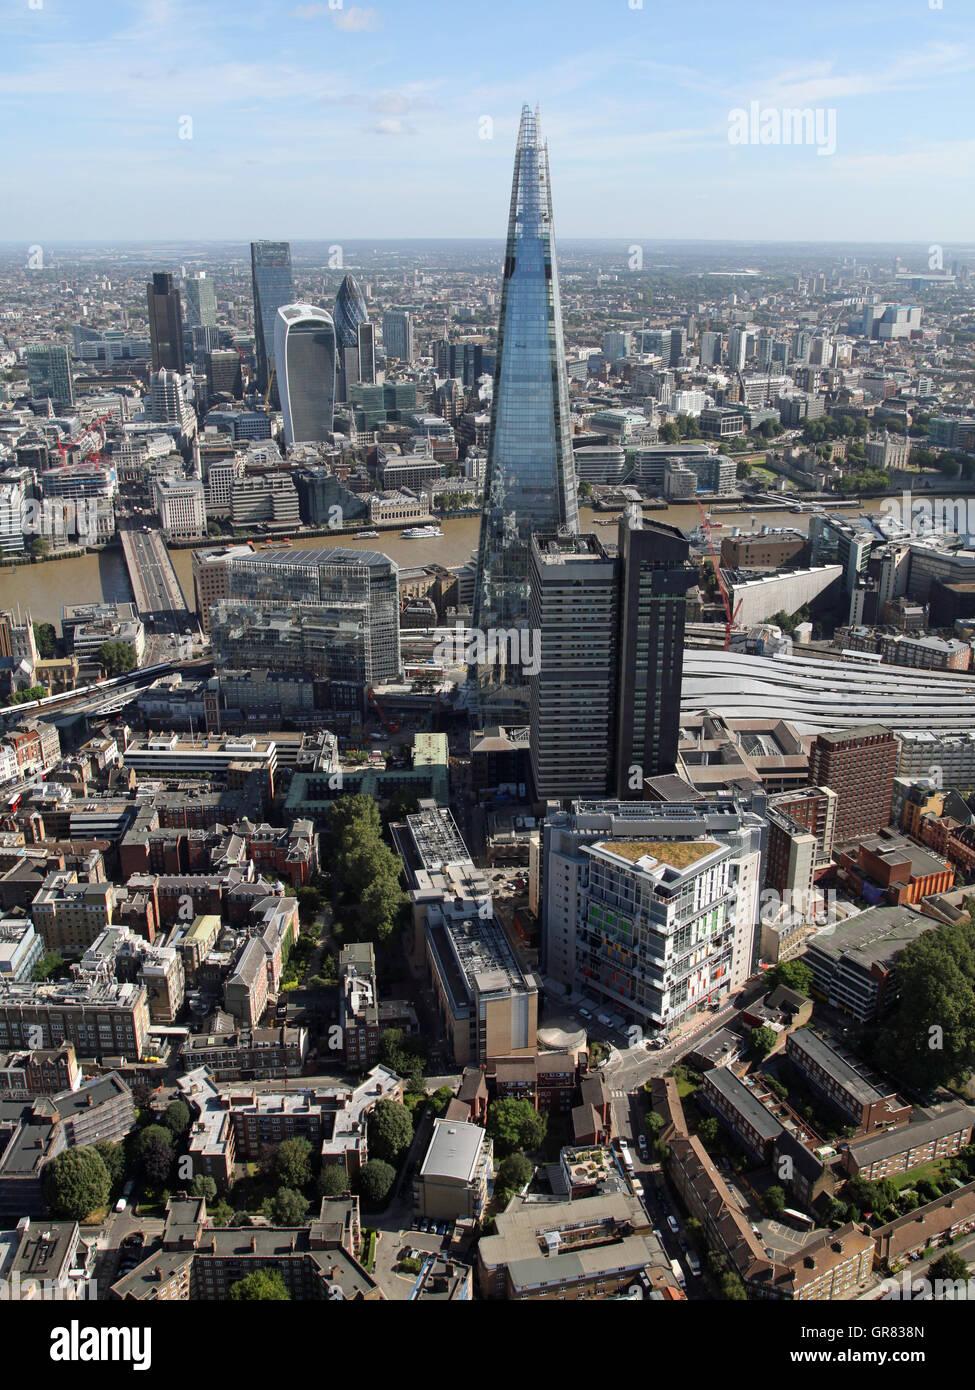 Luftaufnahme von Guys Hospital, SE1, The Shard, Themse und The City, London, UK Stockbild